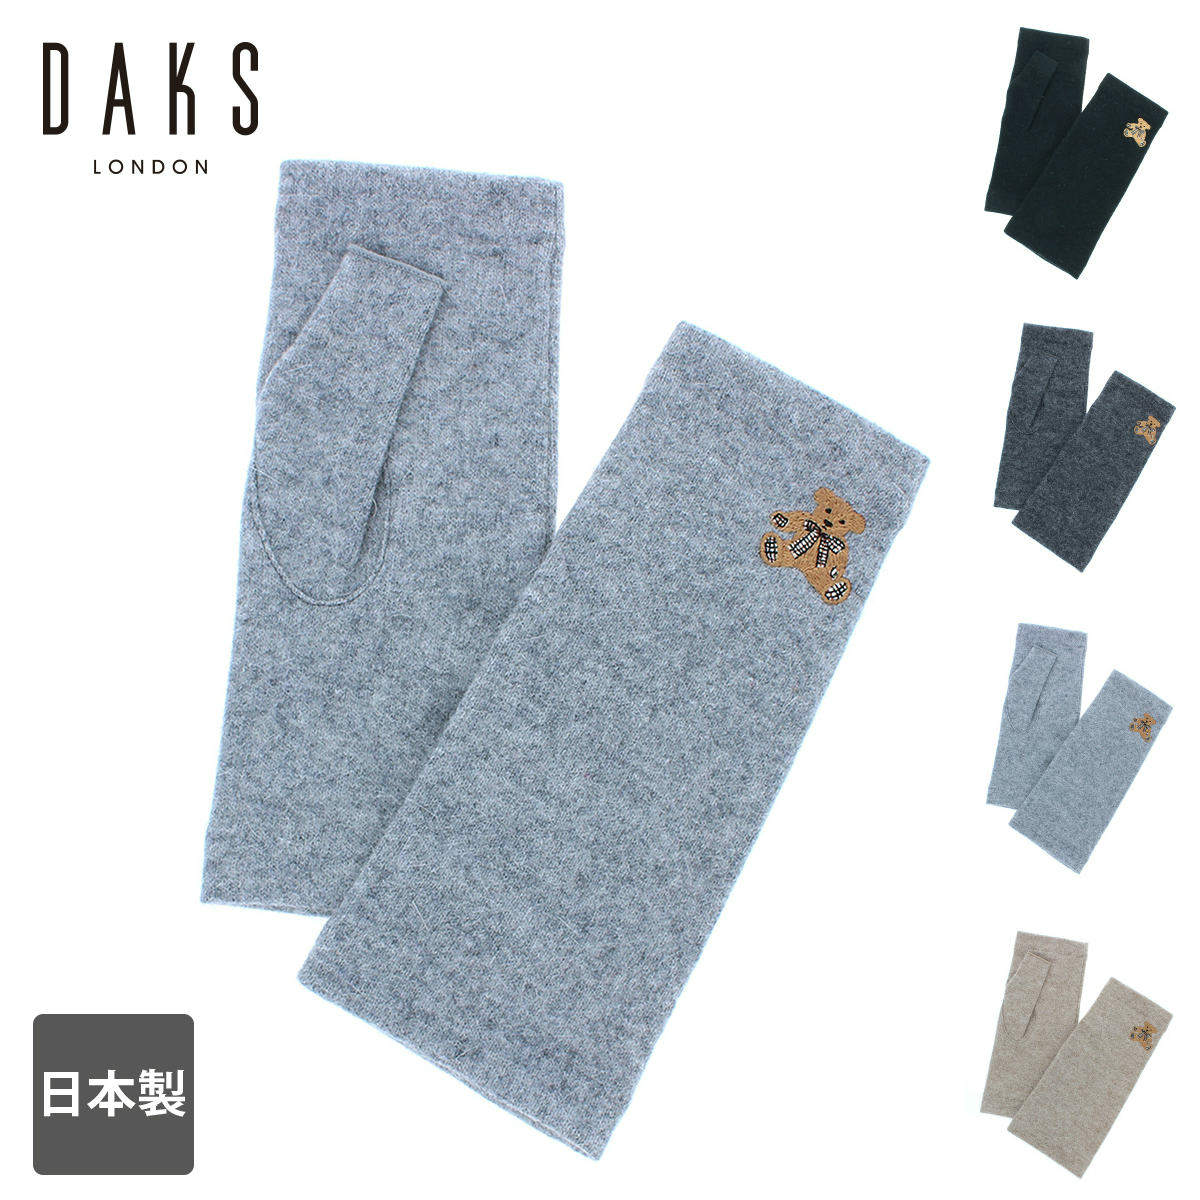 【SALE】ダックス DAKS レディース ウール混ジャージ 手袋 指なし手袋 スマホ タッチパネル対応 daksオリジナル テディベア ワンポイント刺繍 日本製